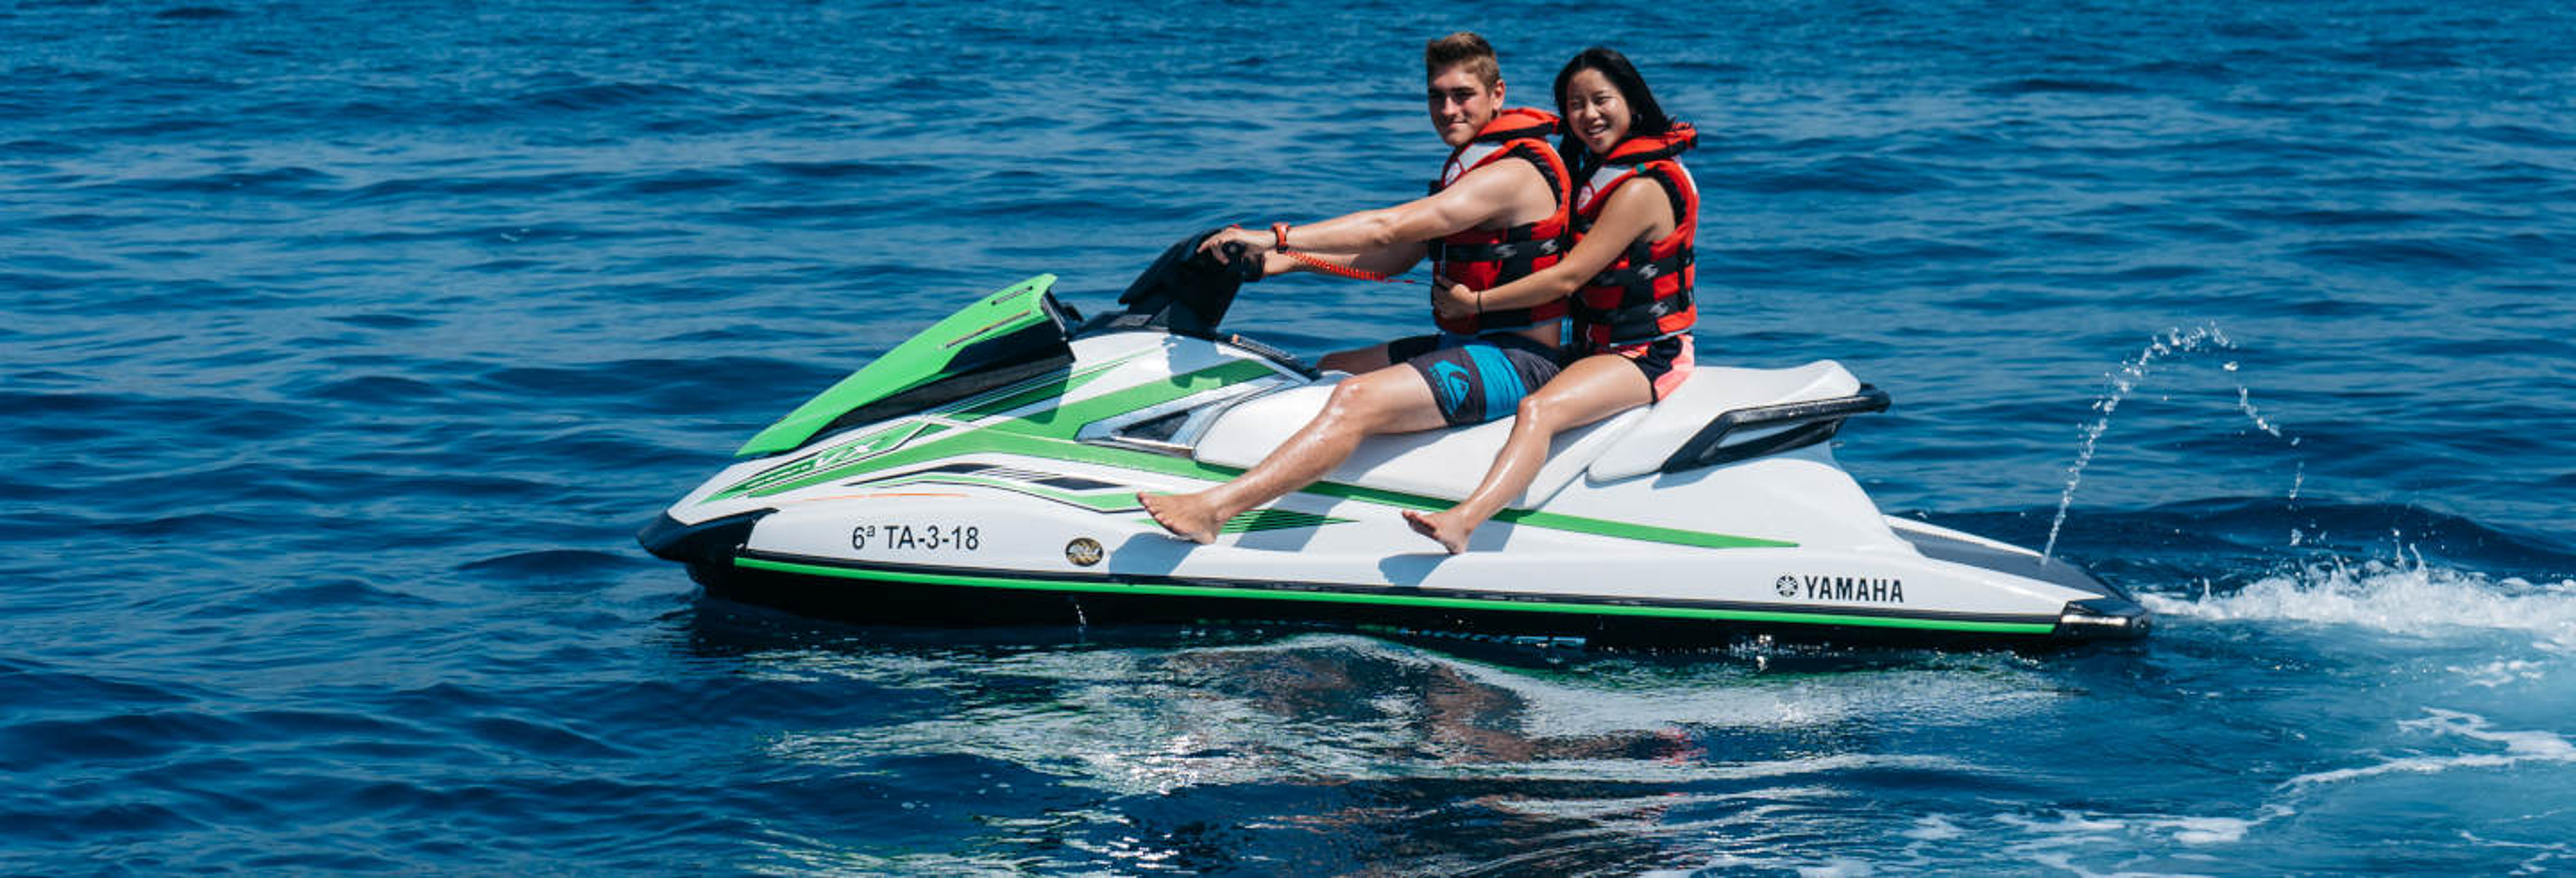 Tour di Salou in moto d'acqua